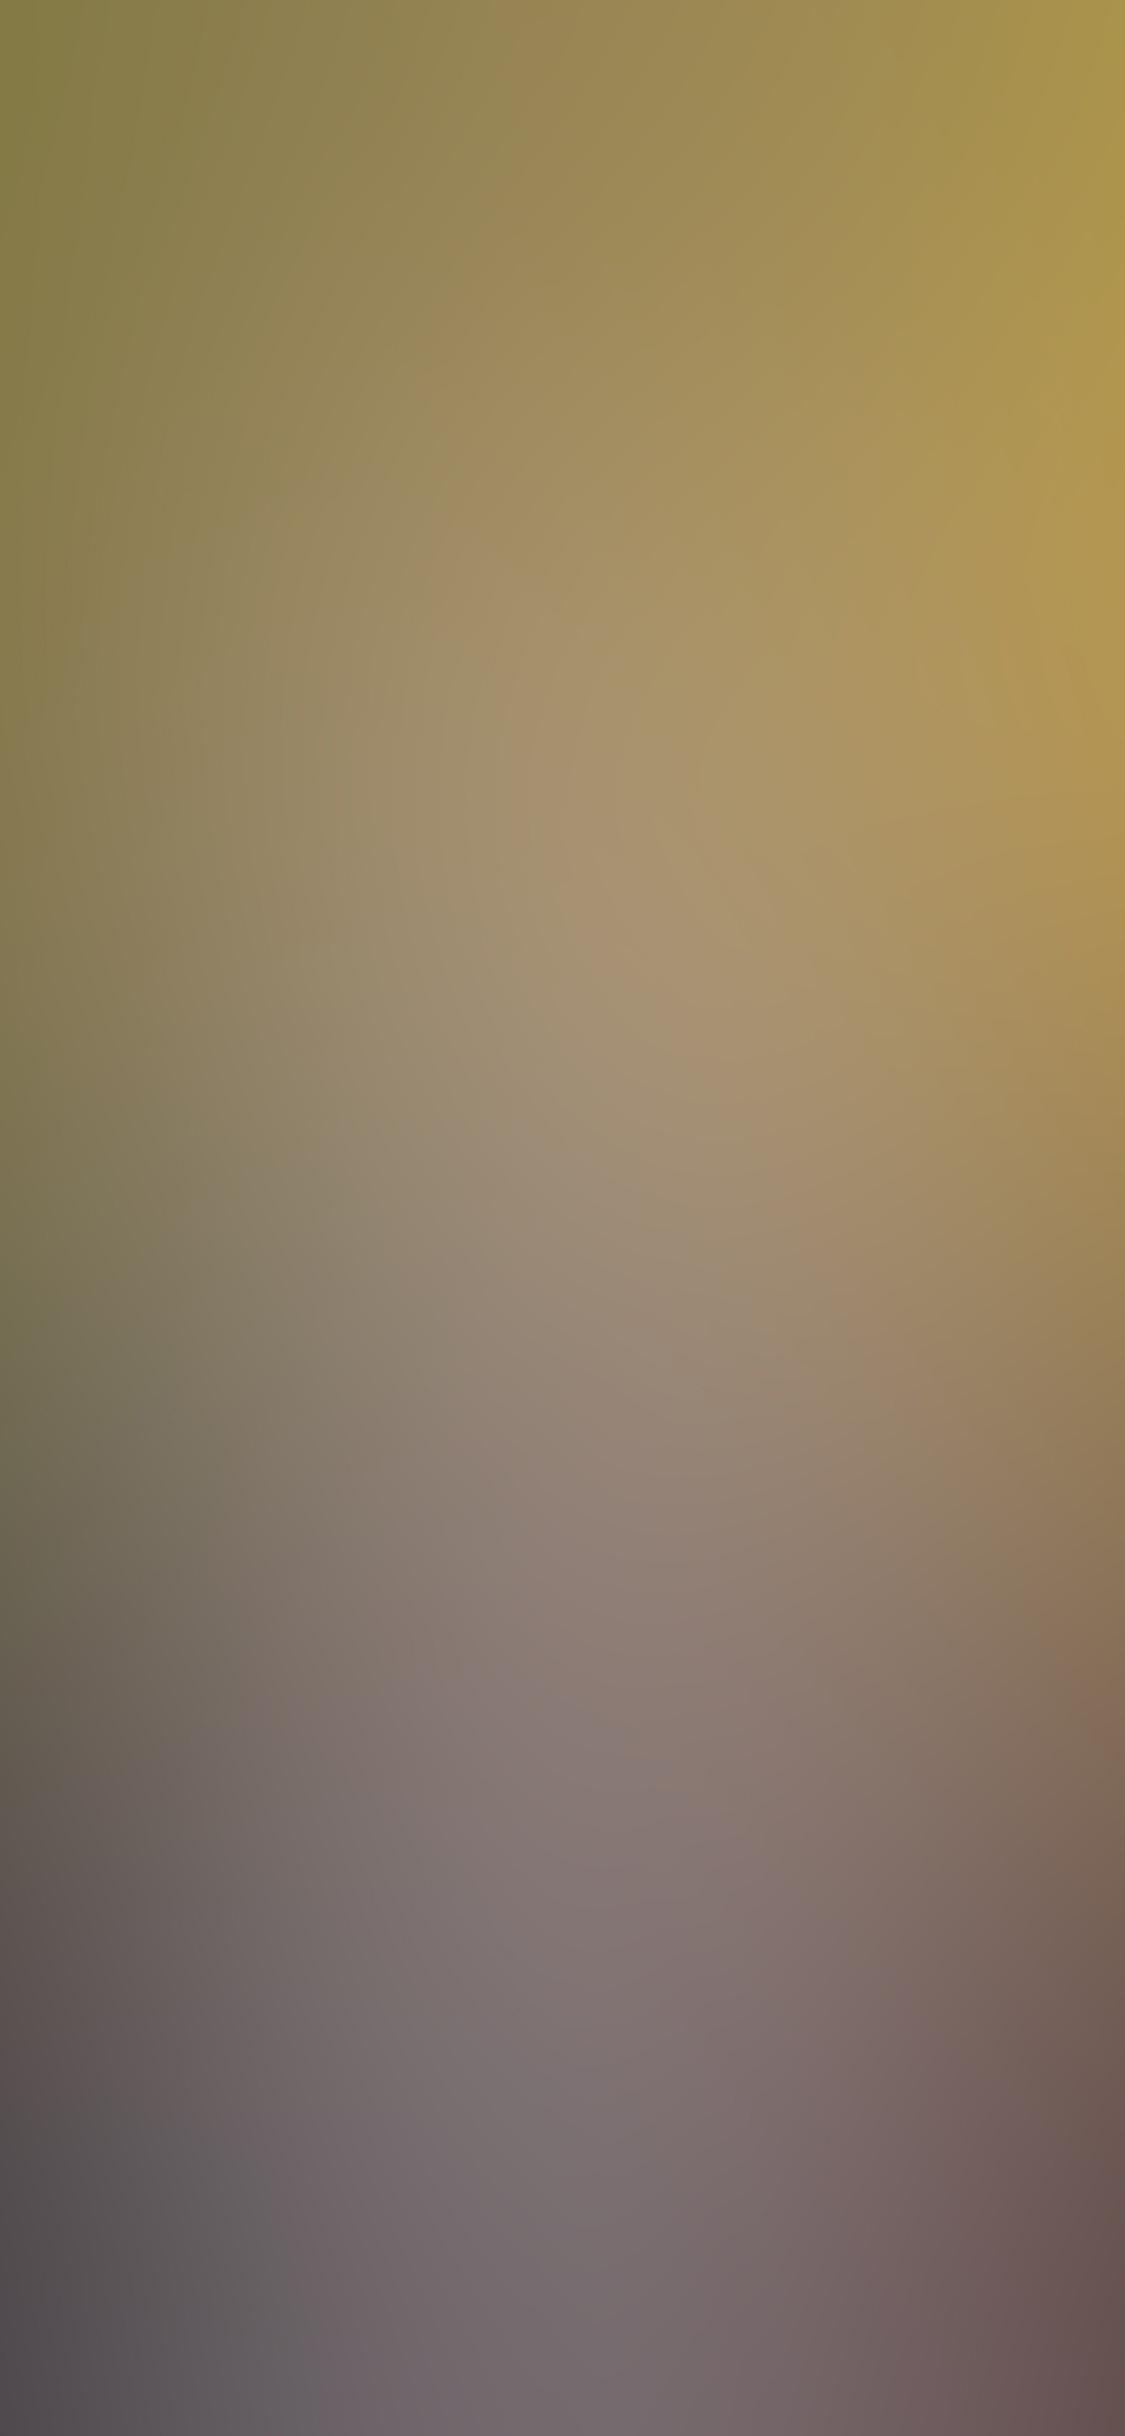 iPhoneXpapers.com-Apple-iPhone-wallpaper-si55-nature-light-gradation-blur